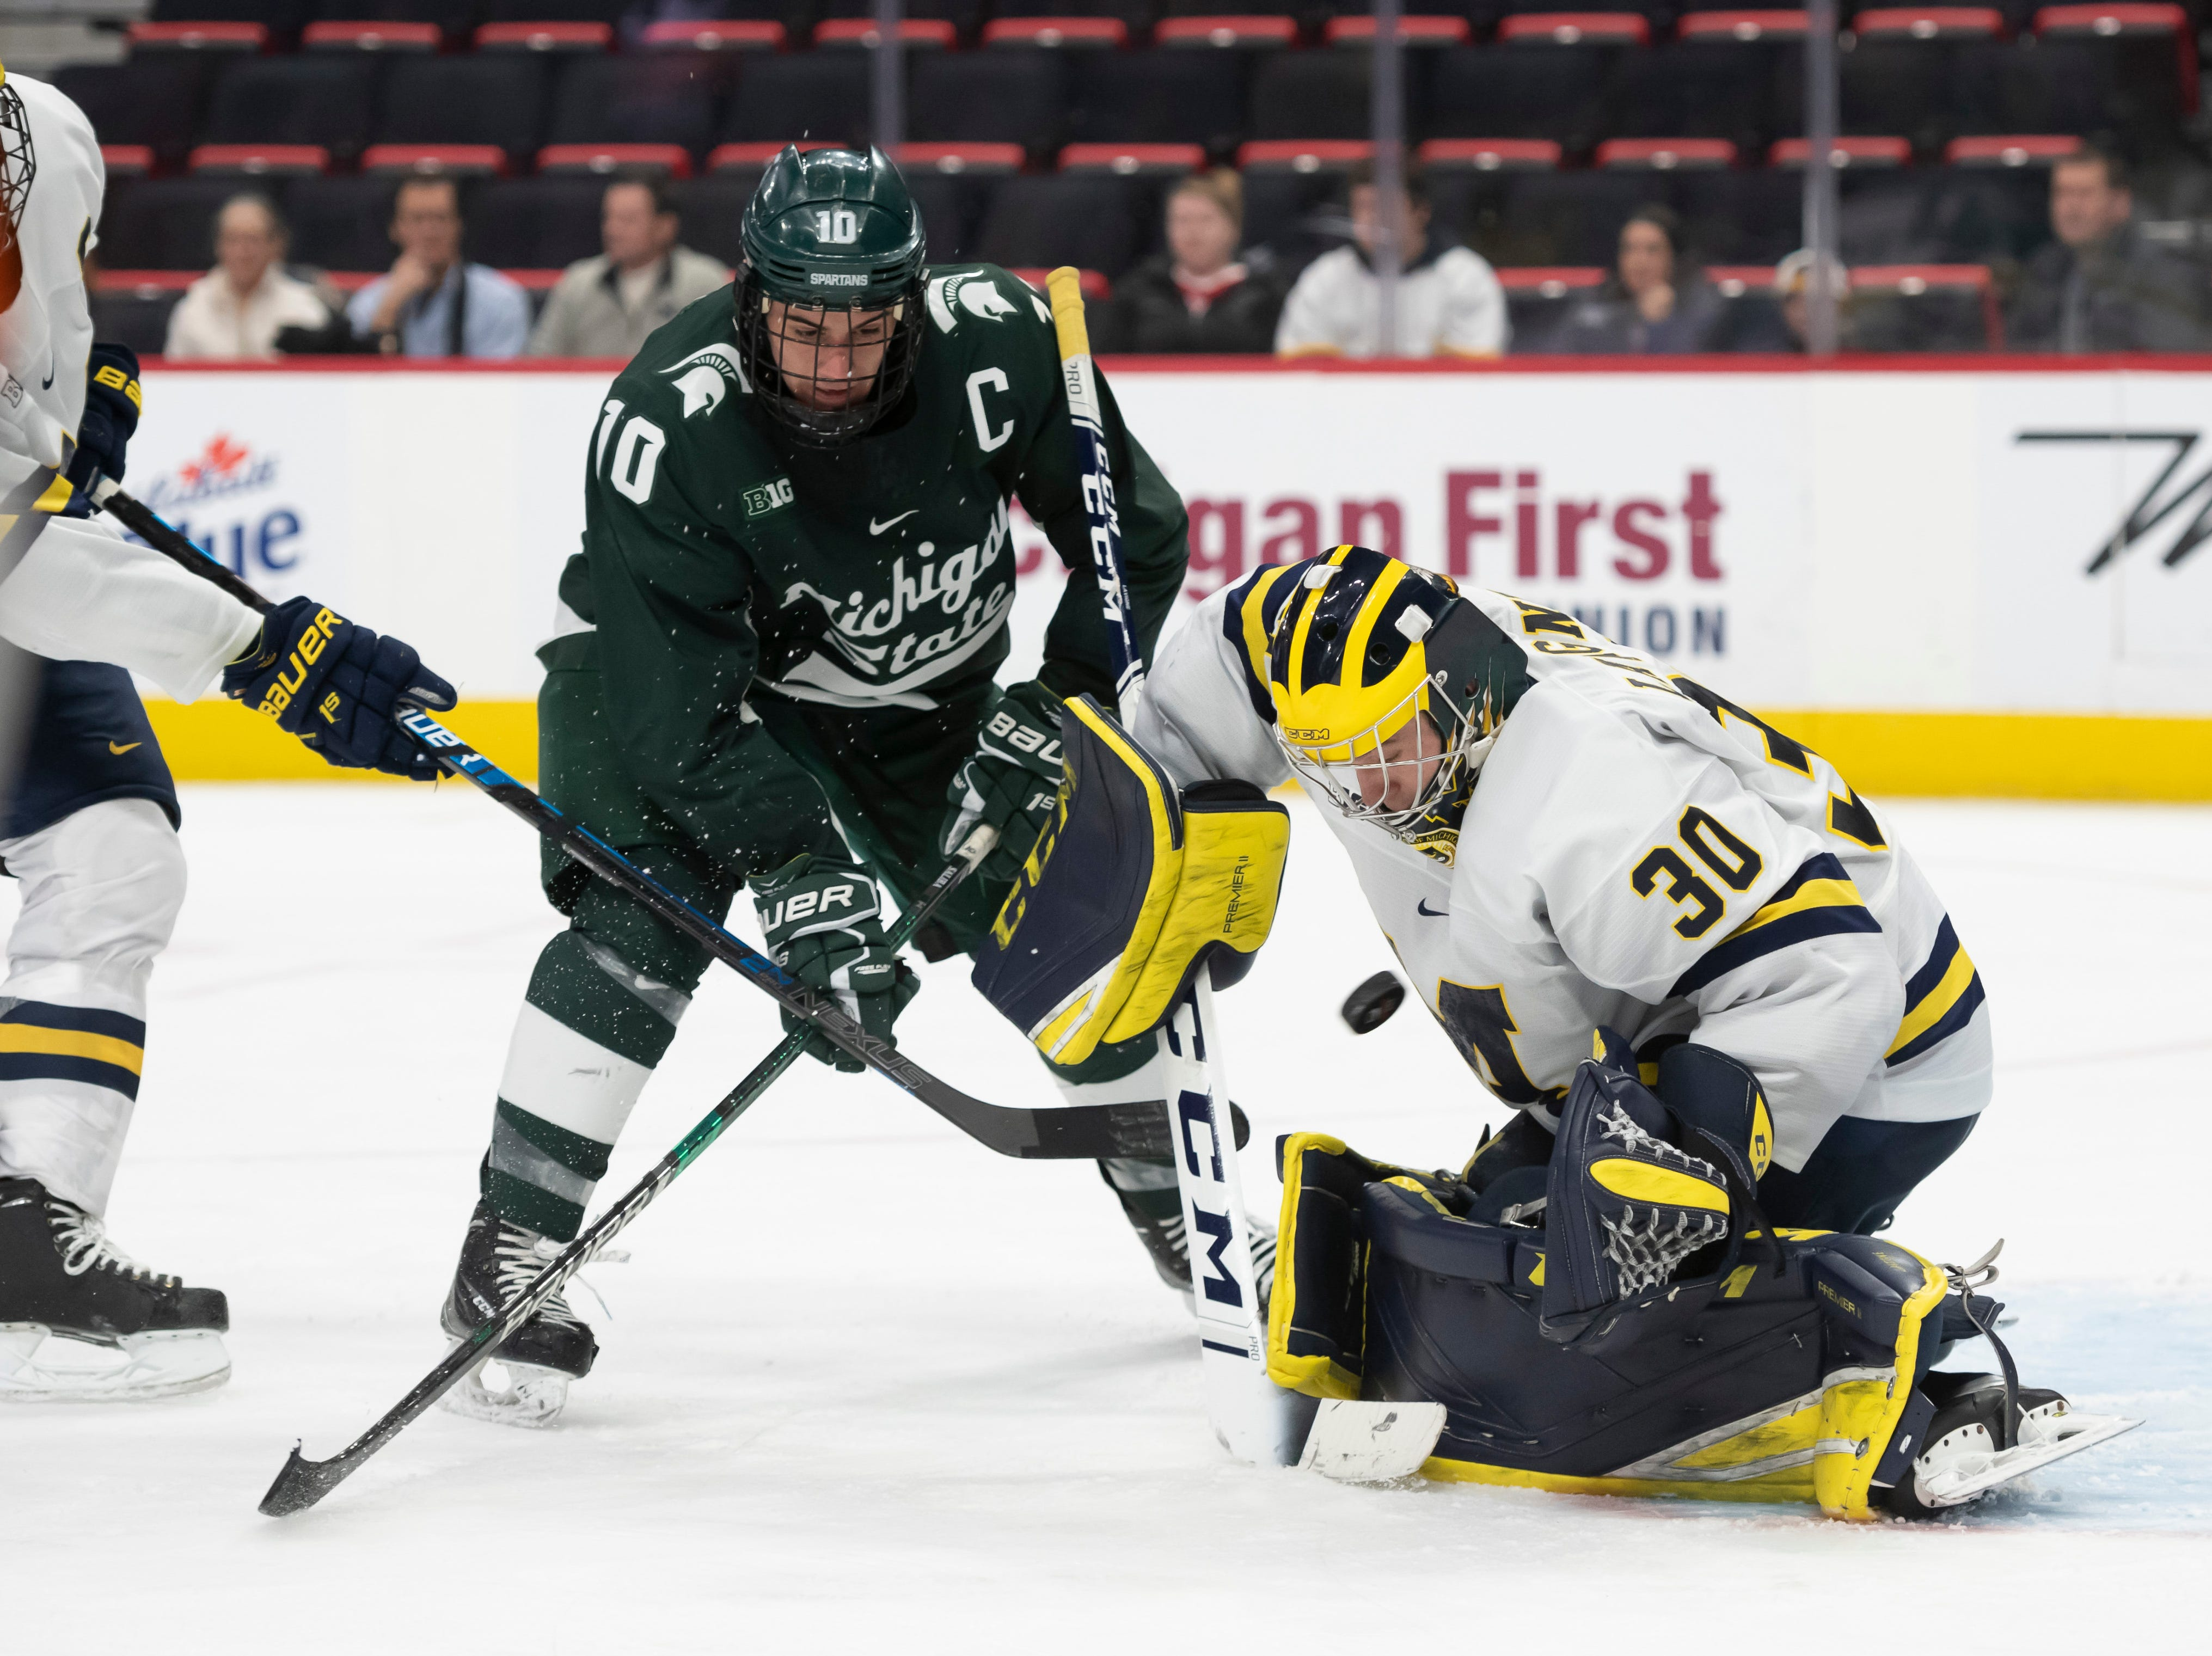 Michigan State forward Sam Saliba tries to get the puck past Michigan goaltender Hayden Lavigne in the second period.